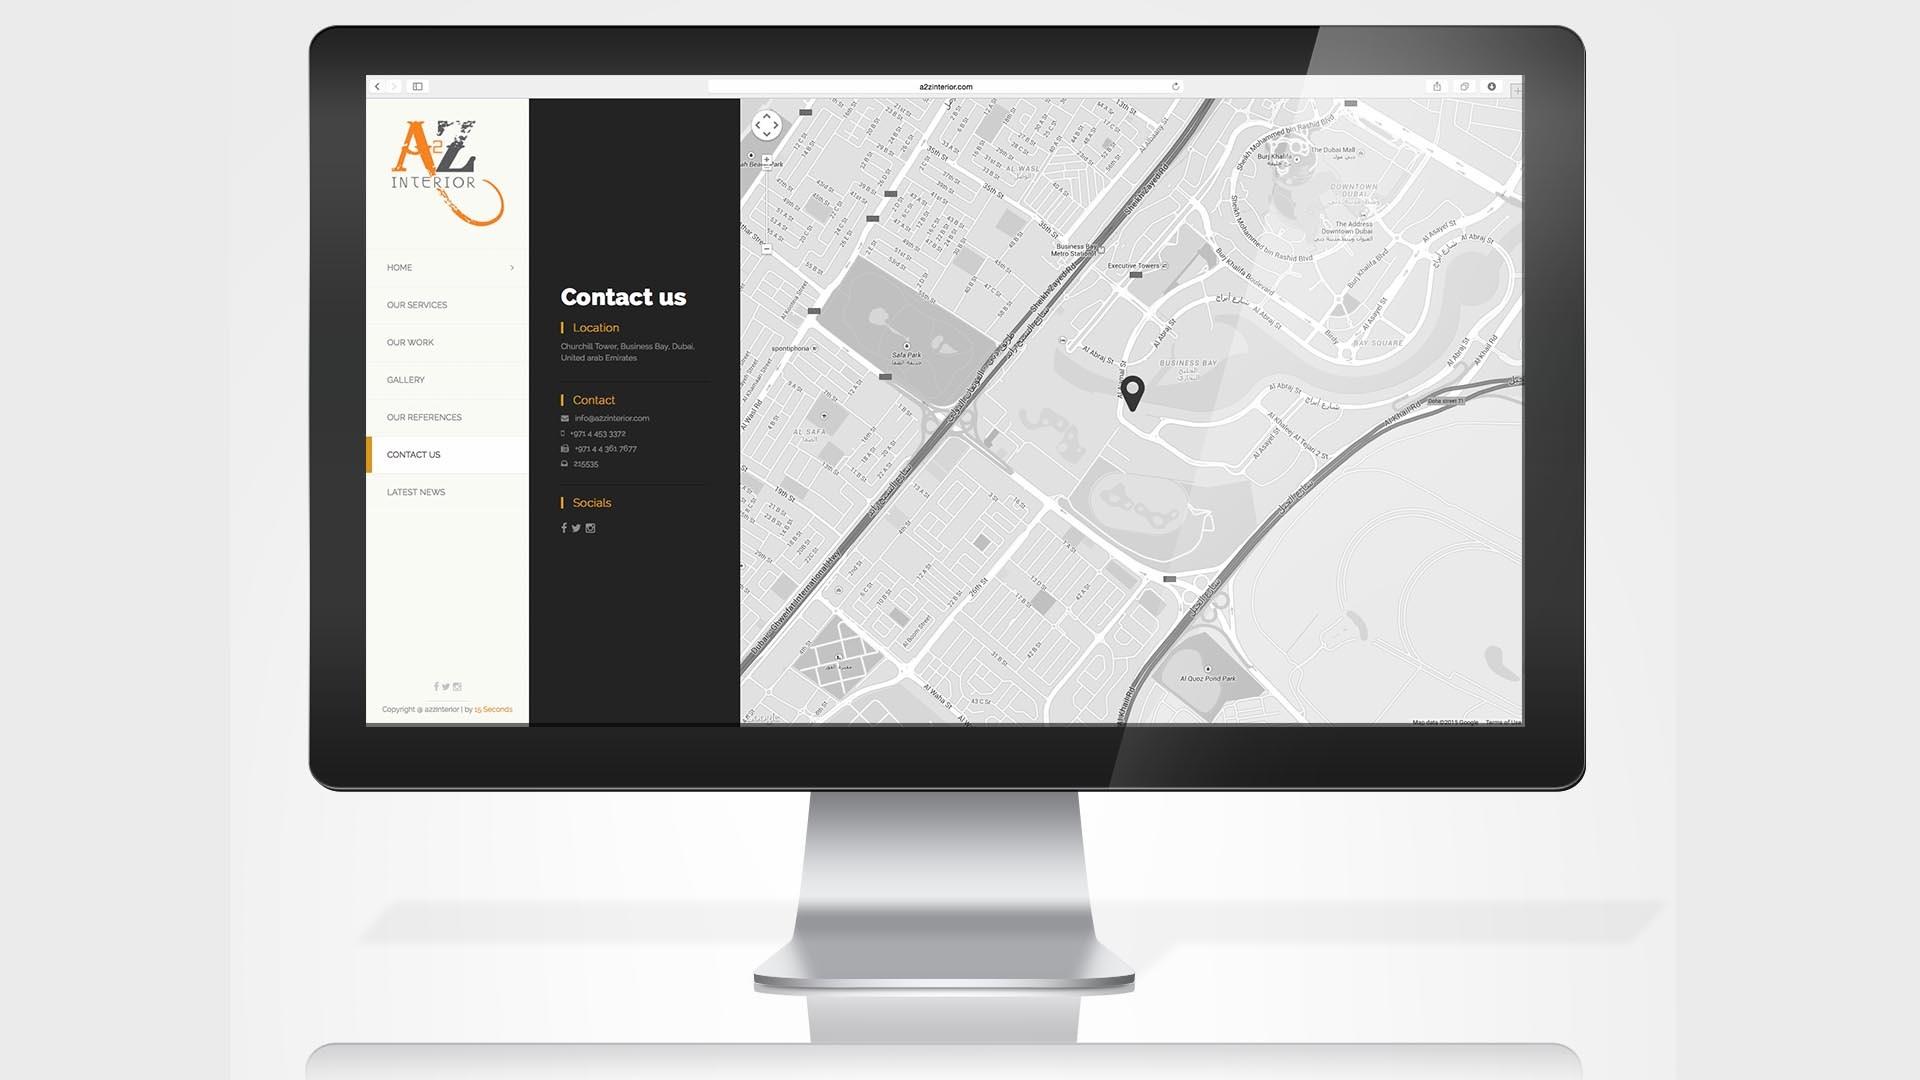 a2z-interiors-website-contact